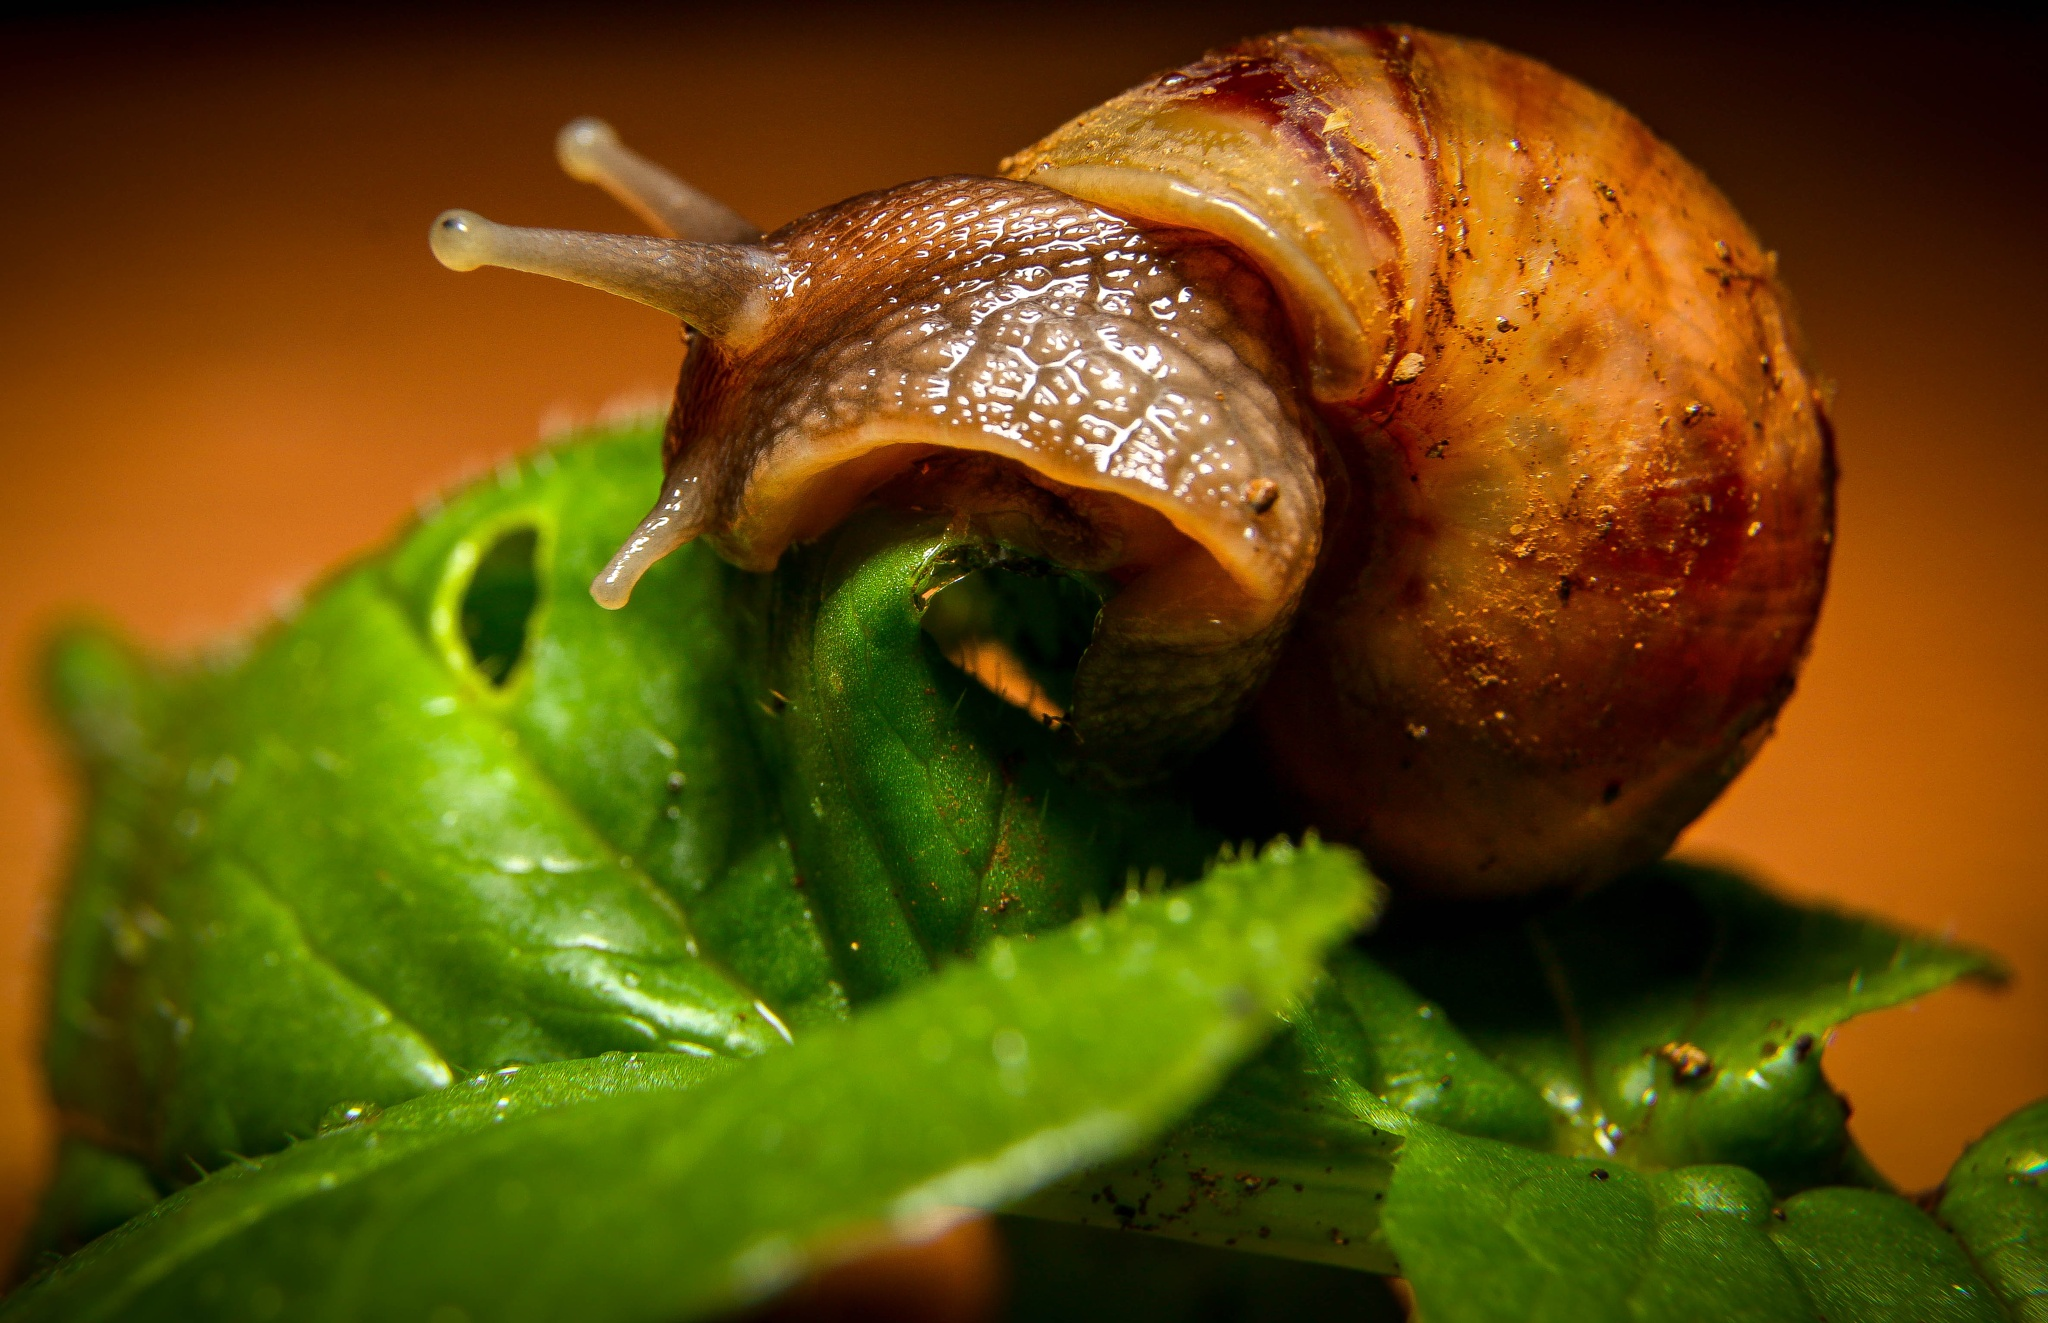 snail closeup by irfanbissessur